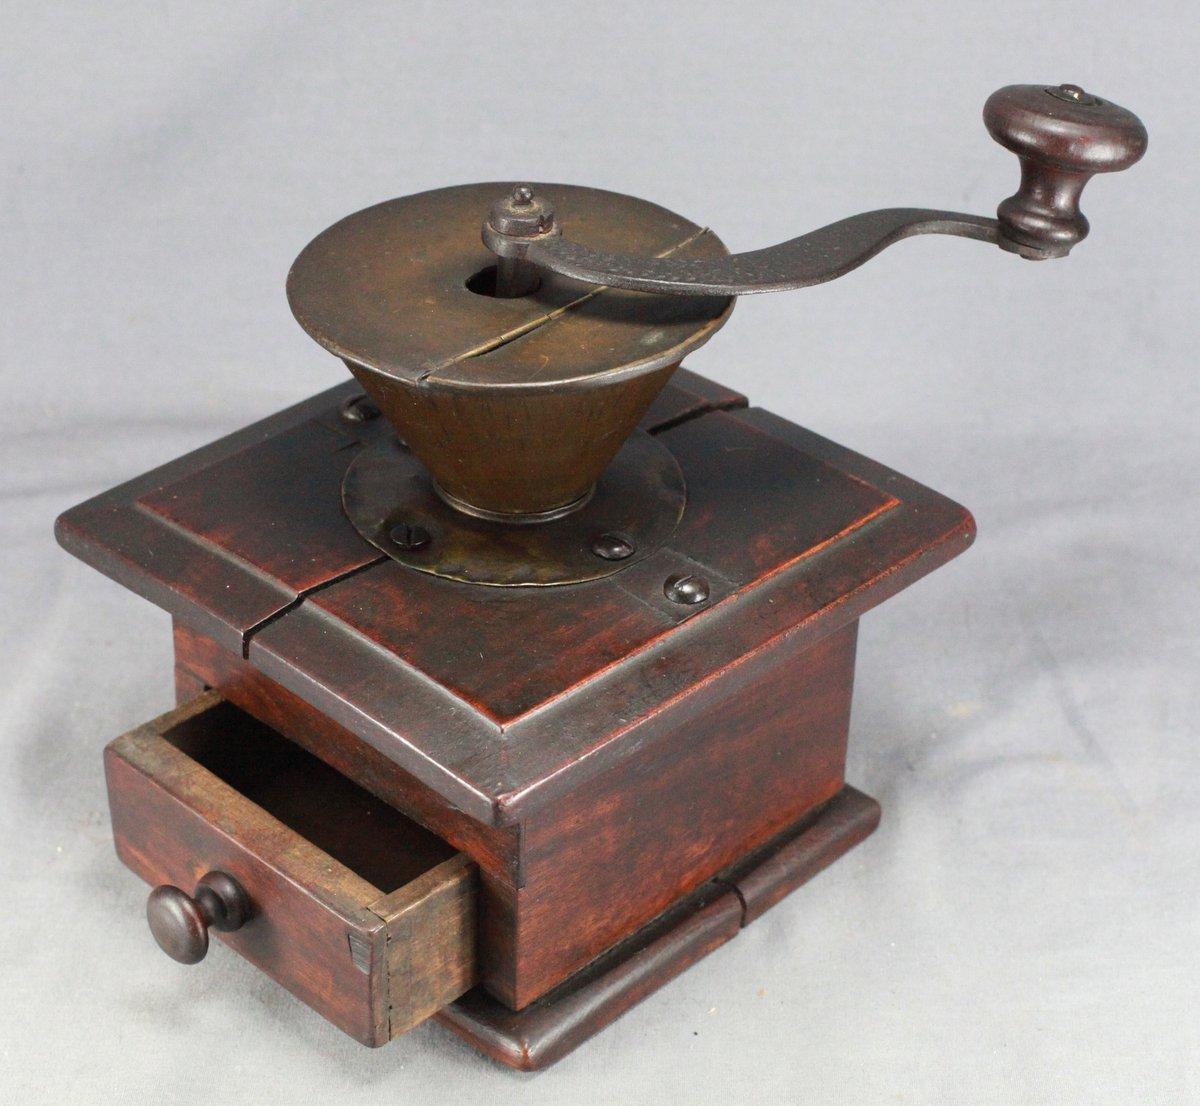 A 19thC. Coffee Grinder